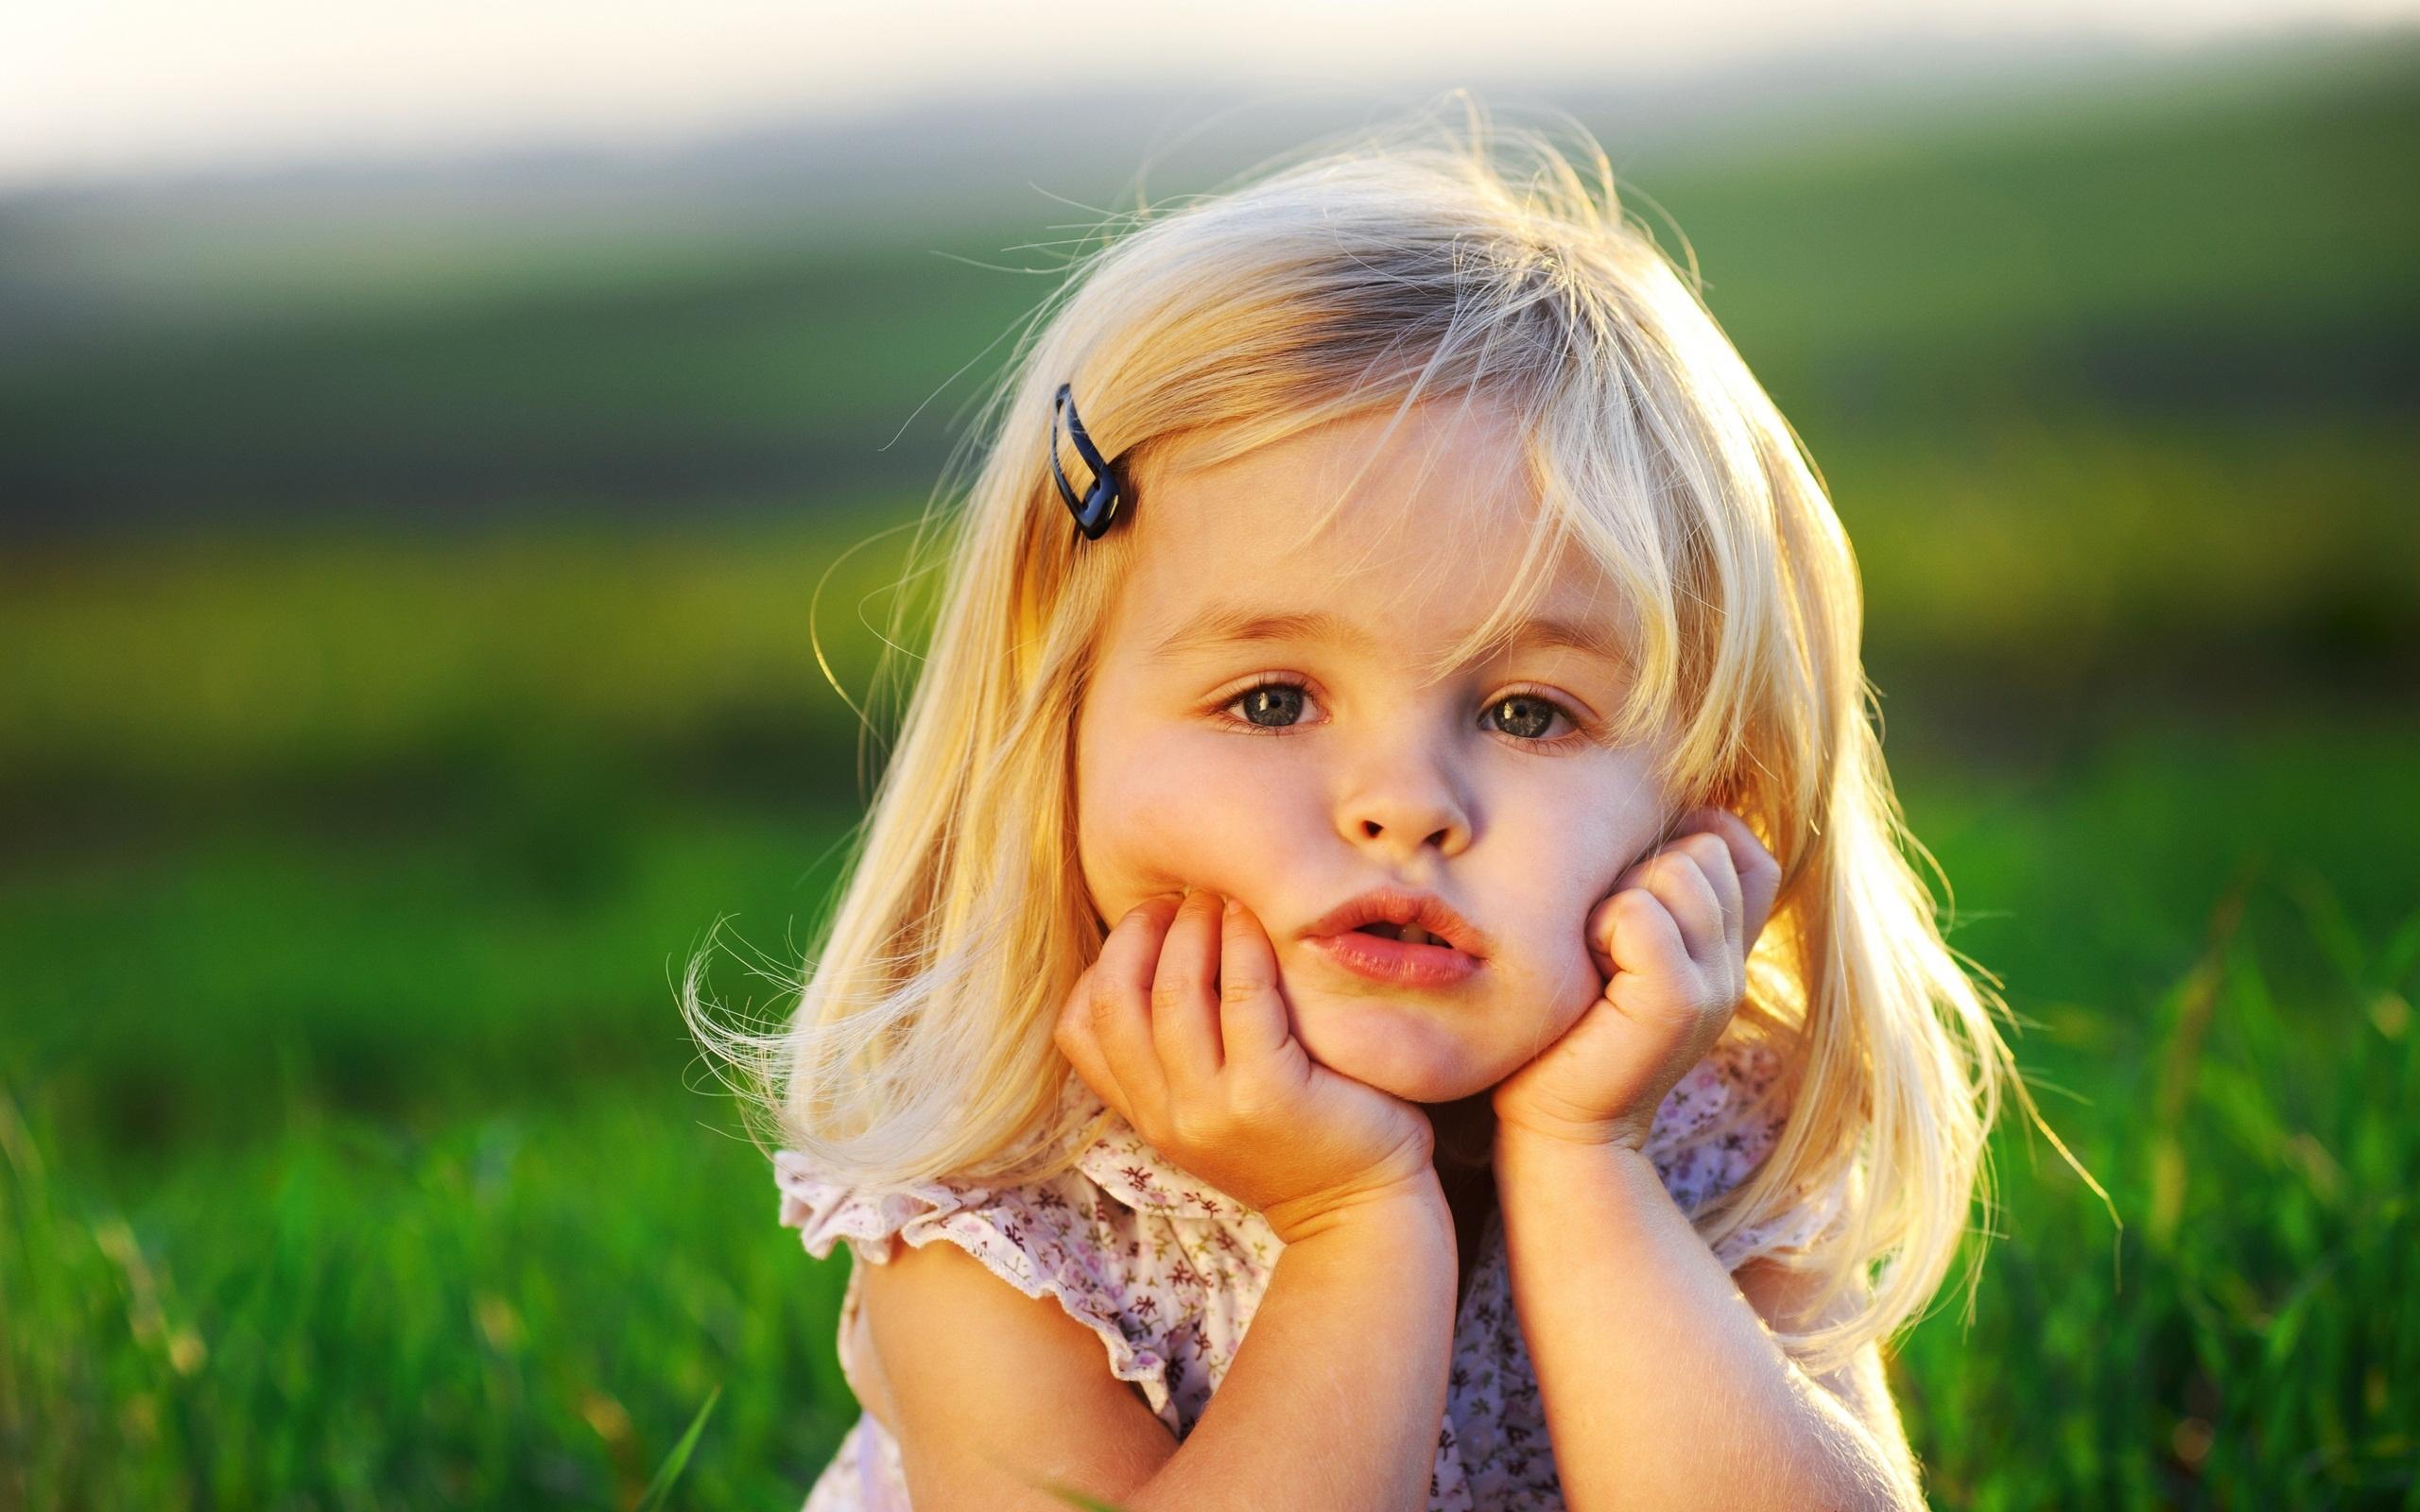 Открытка добрым, картинки маленьким деткам